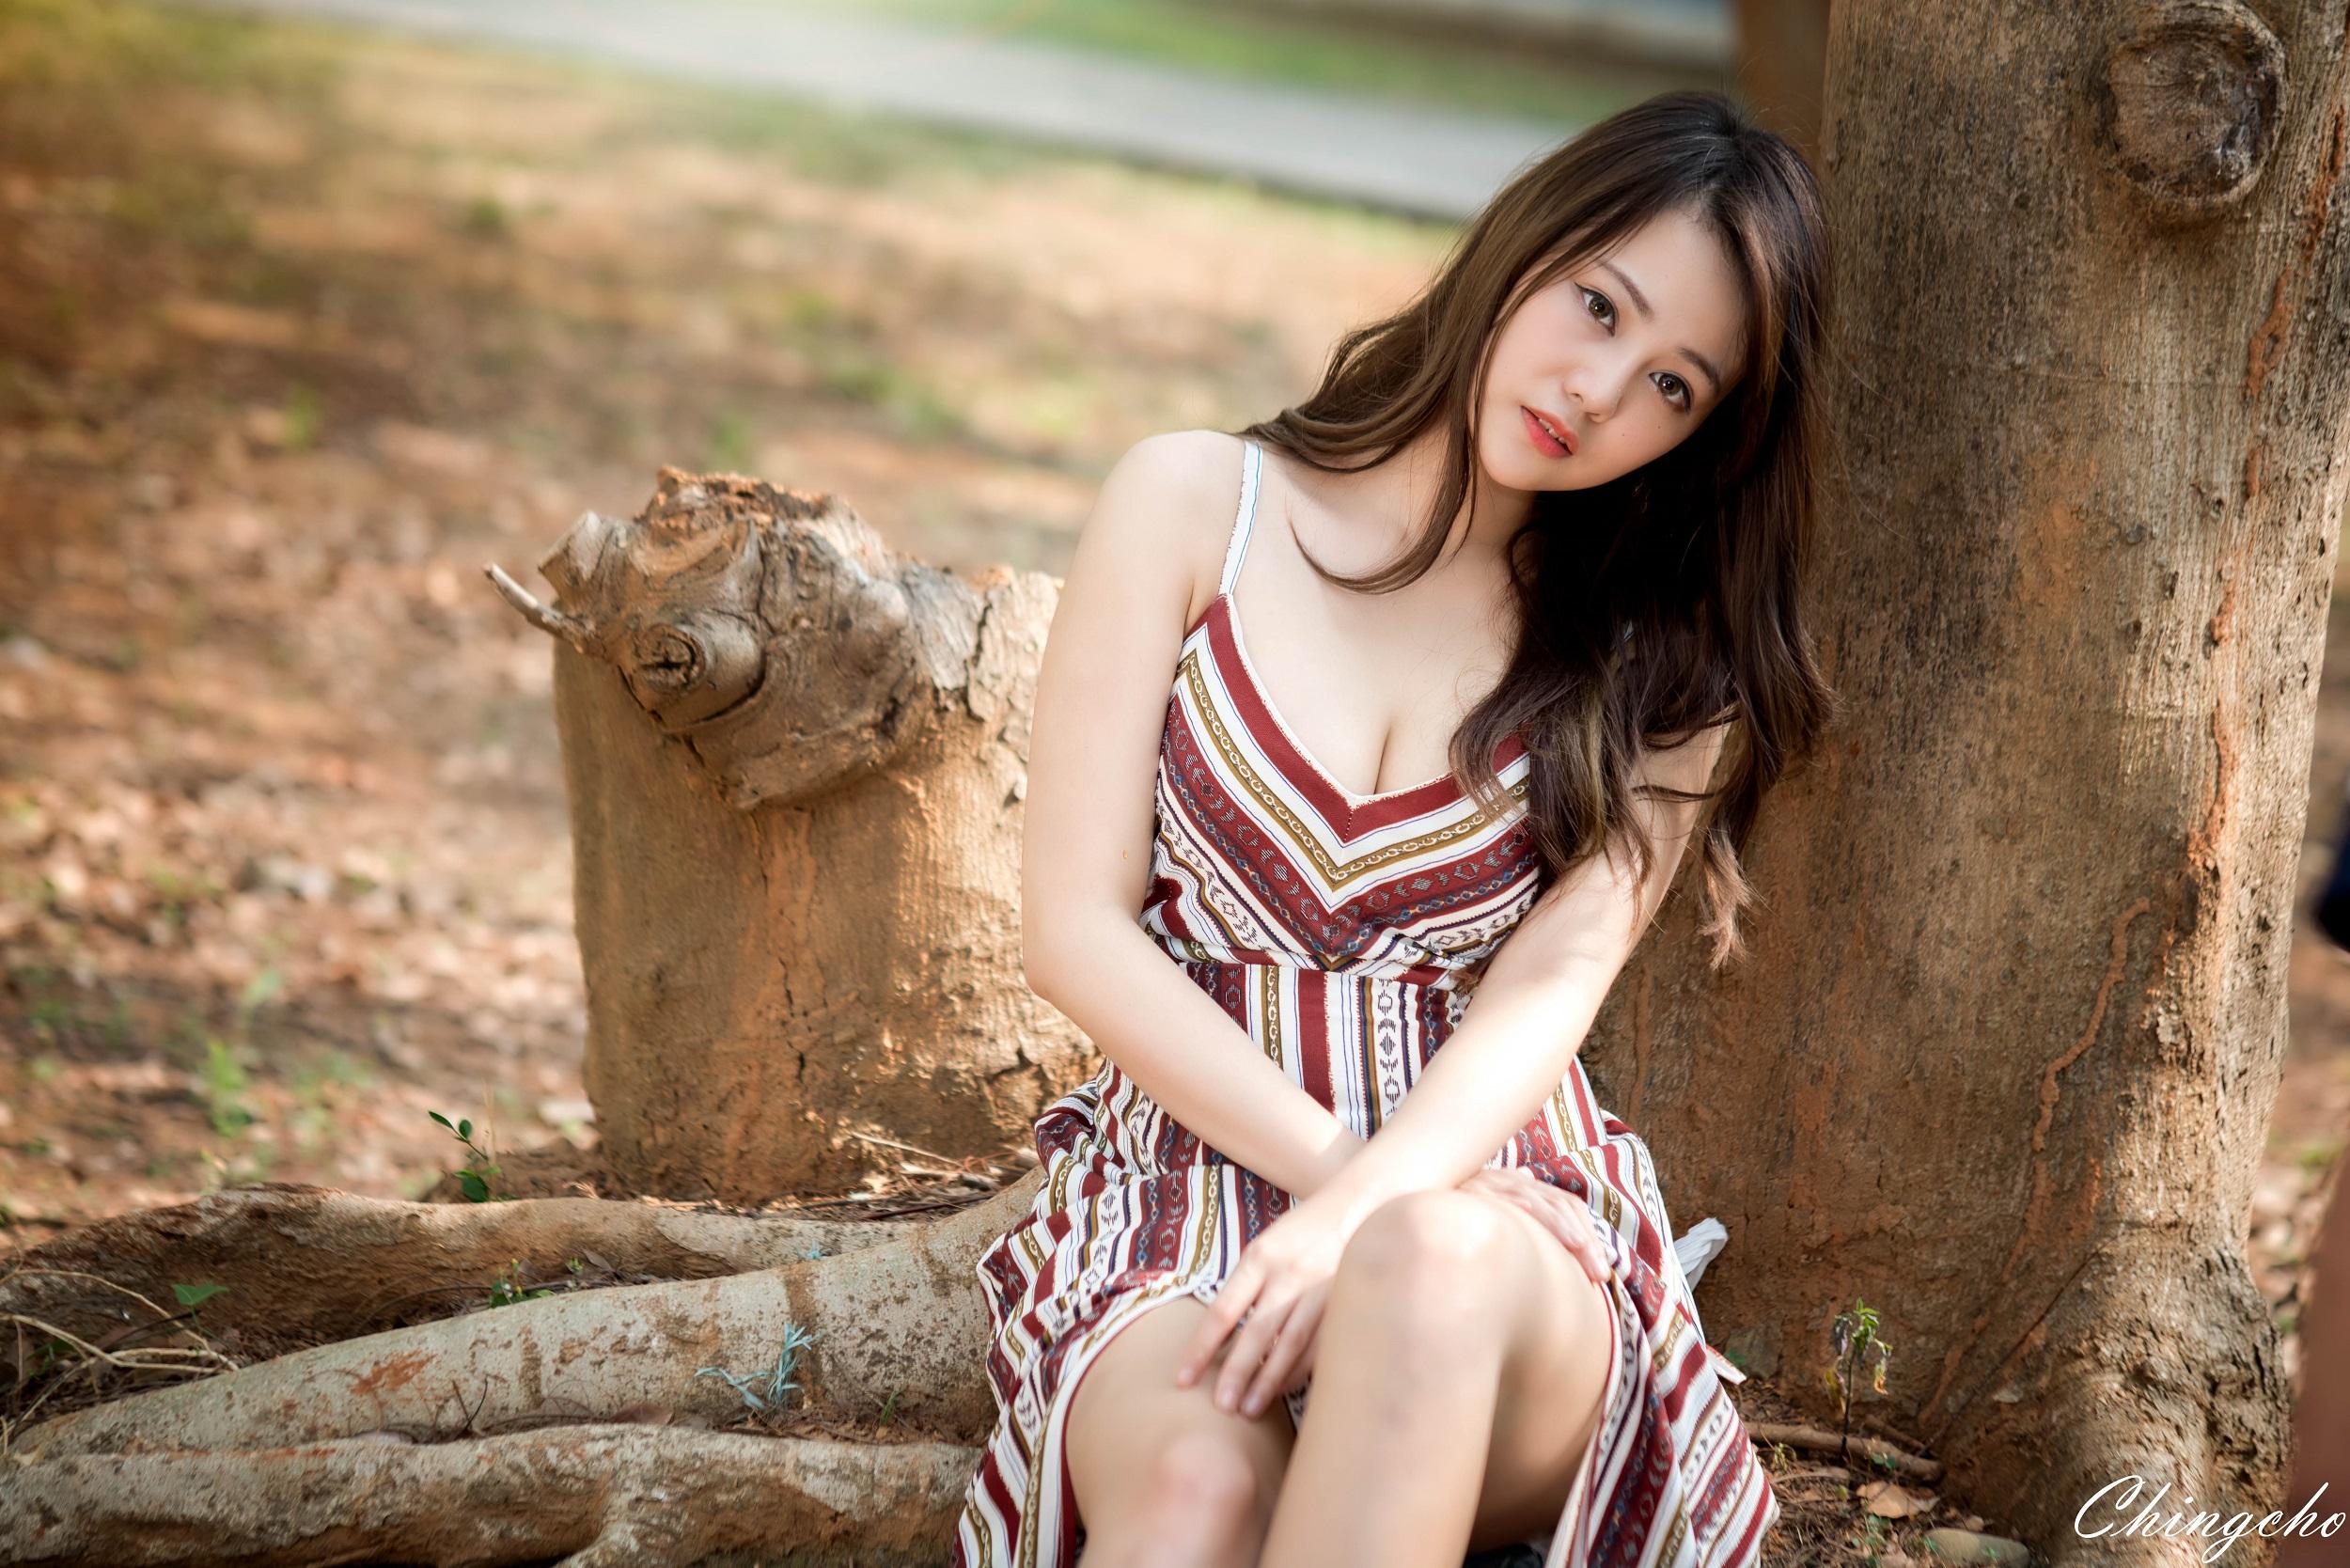 Asian women model picture gallery, oral sex to men benifit women